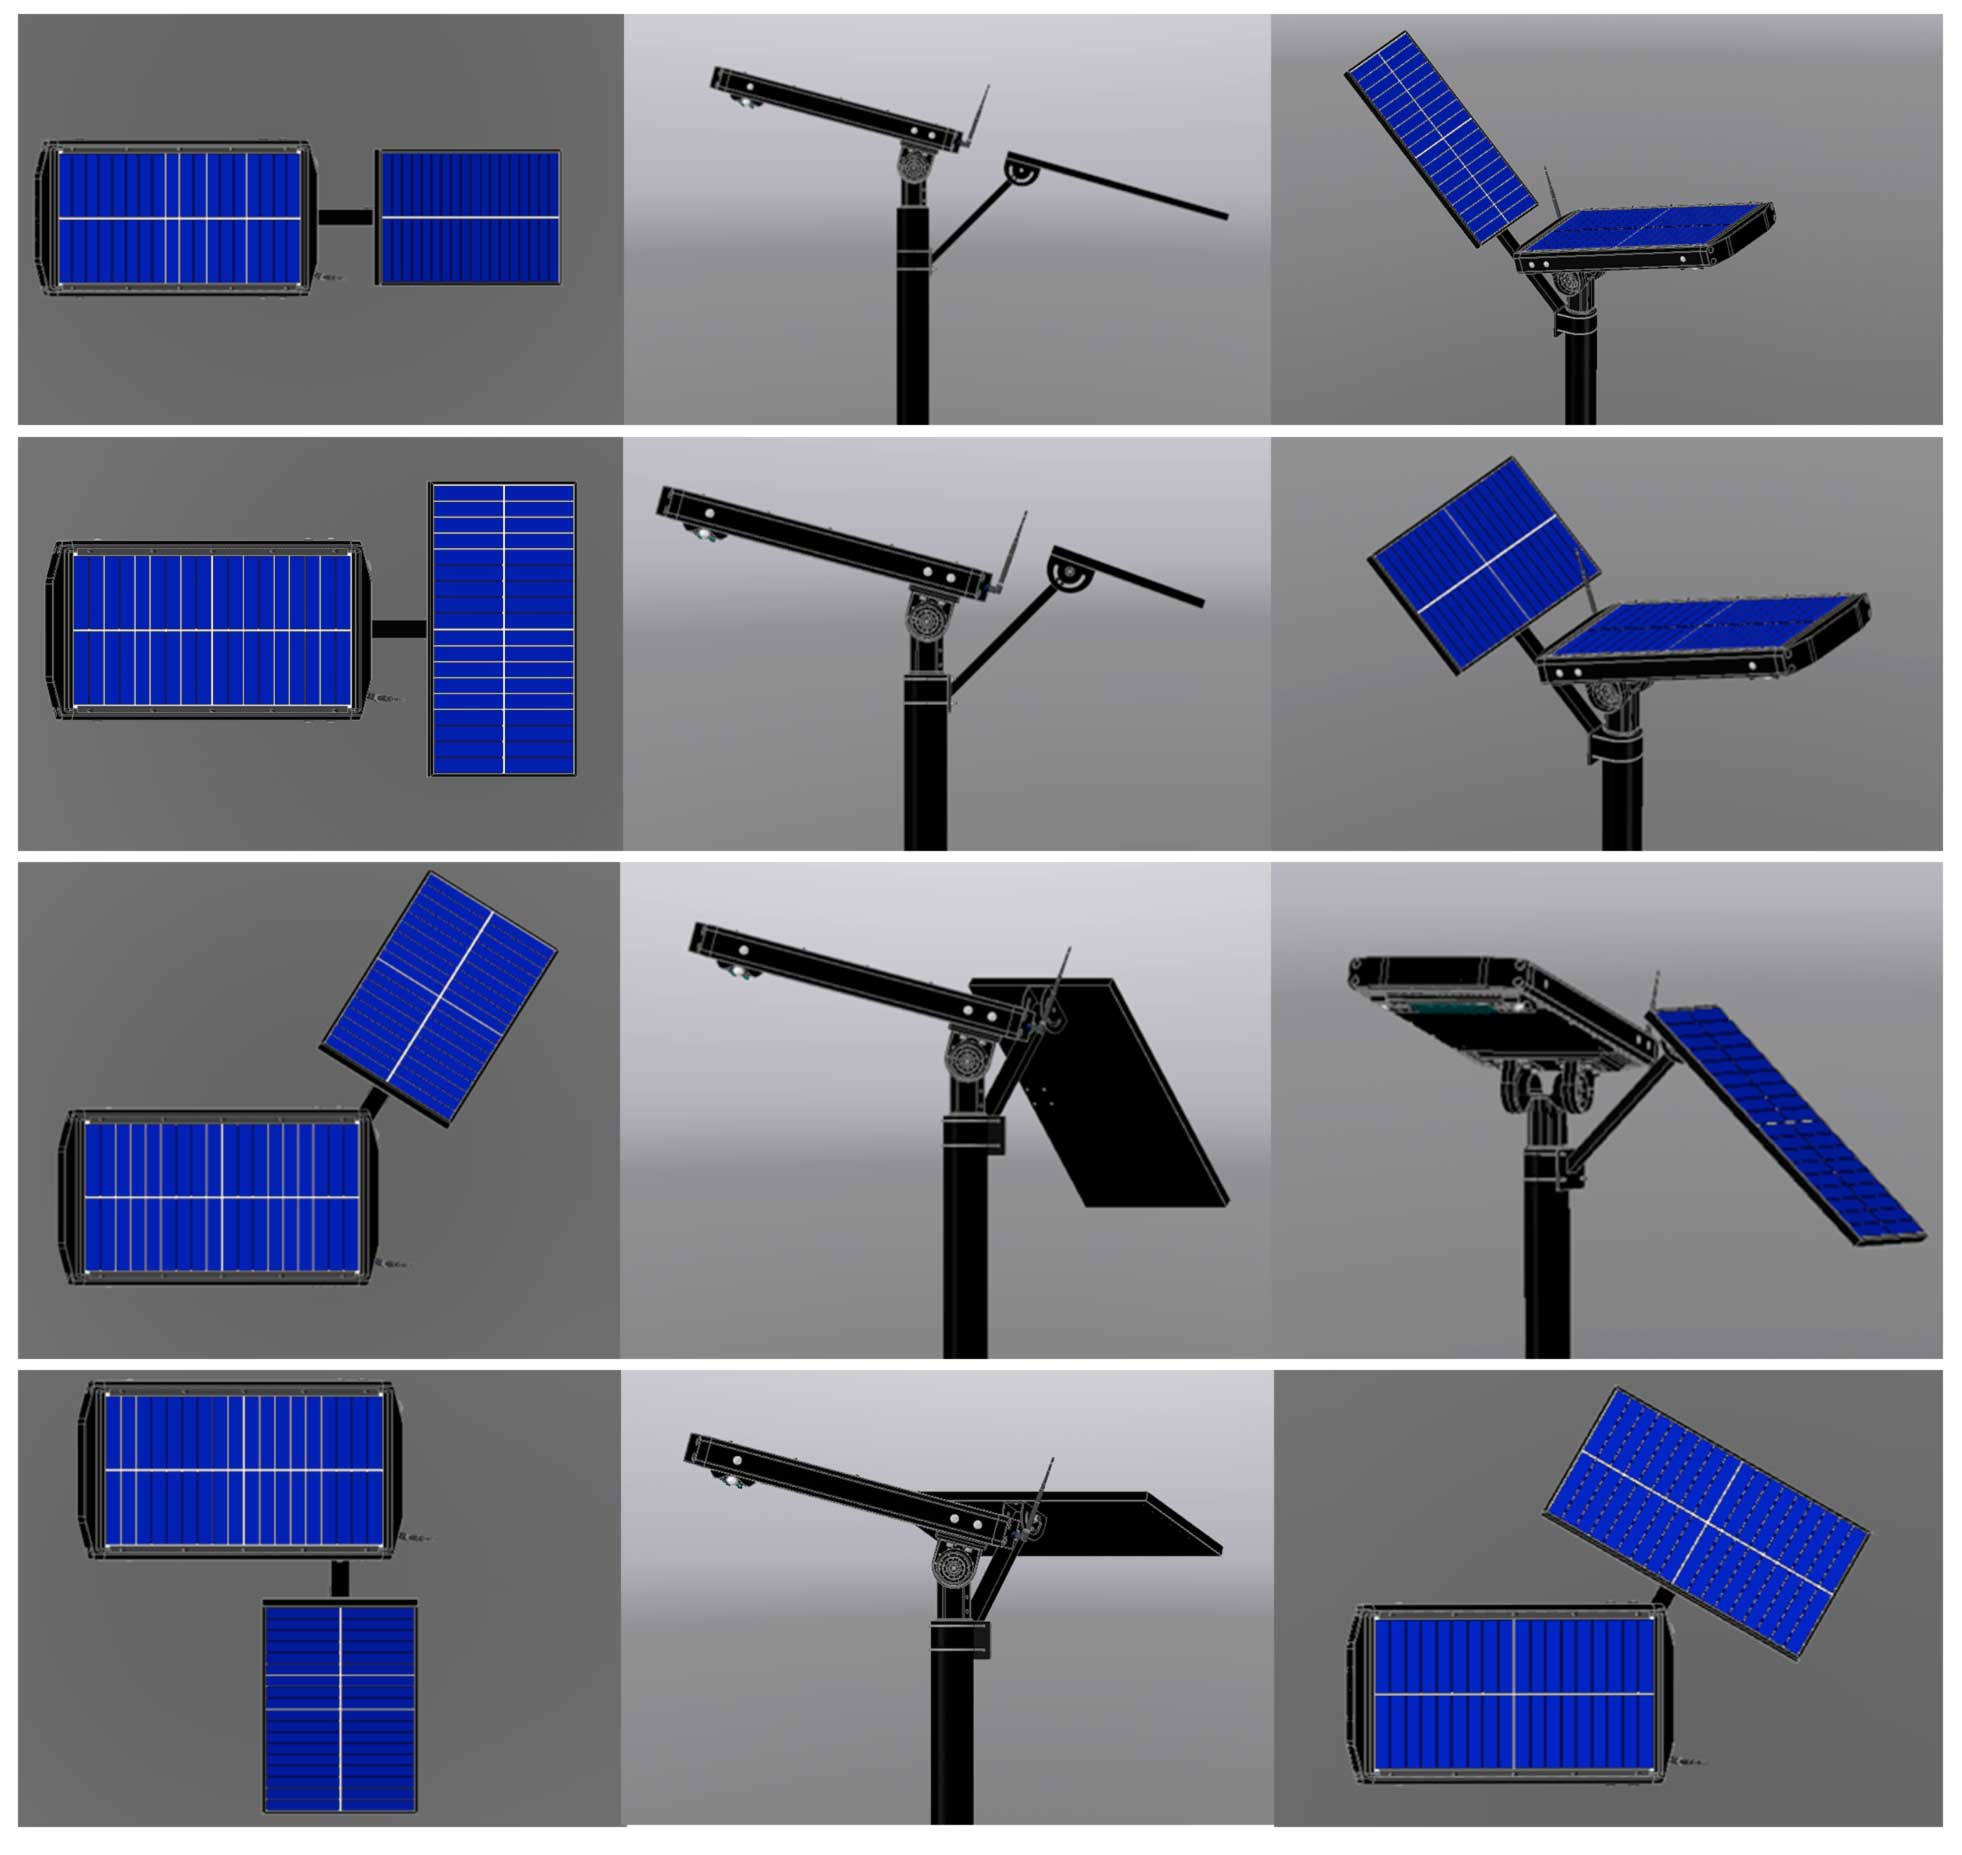 external solatr panel mounting options